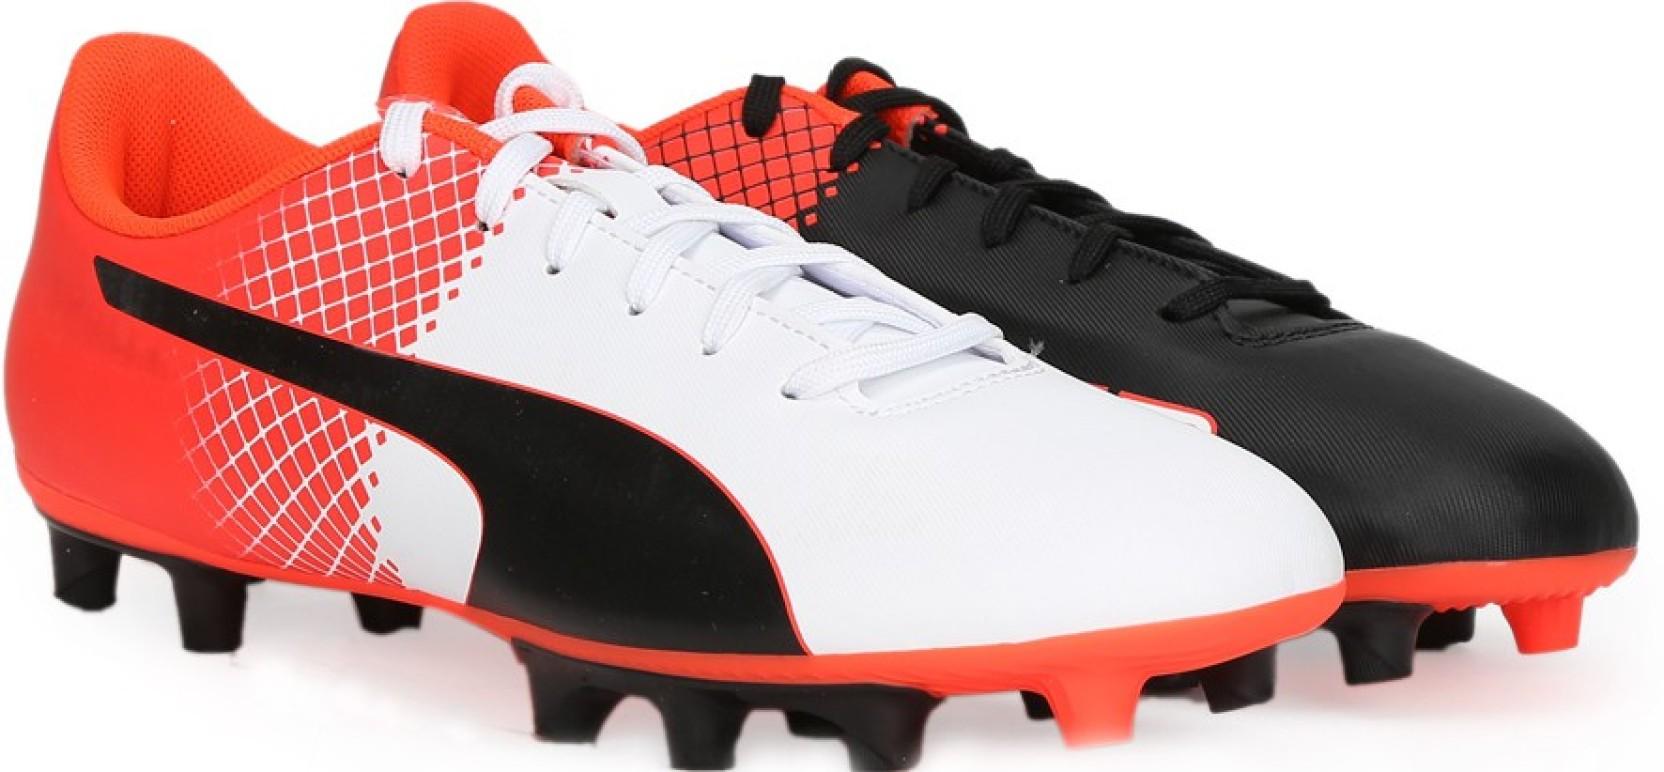 6d43b52bc3d Puma evoSPEED 5.5 FG Football Shoes For Men - Buy Puma Black-Puma ...